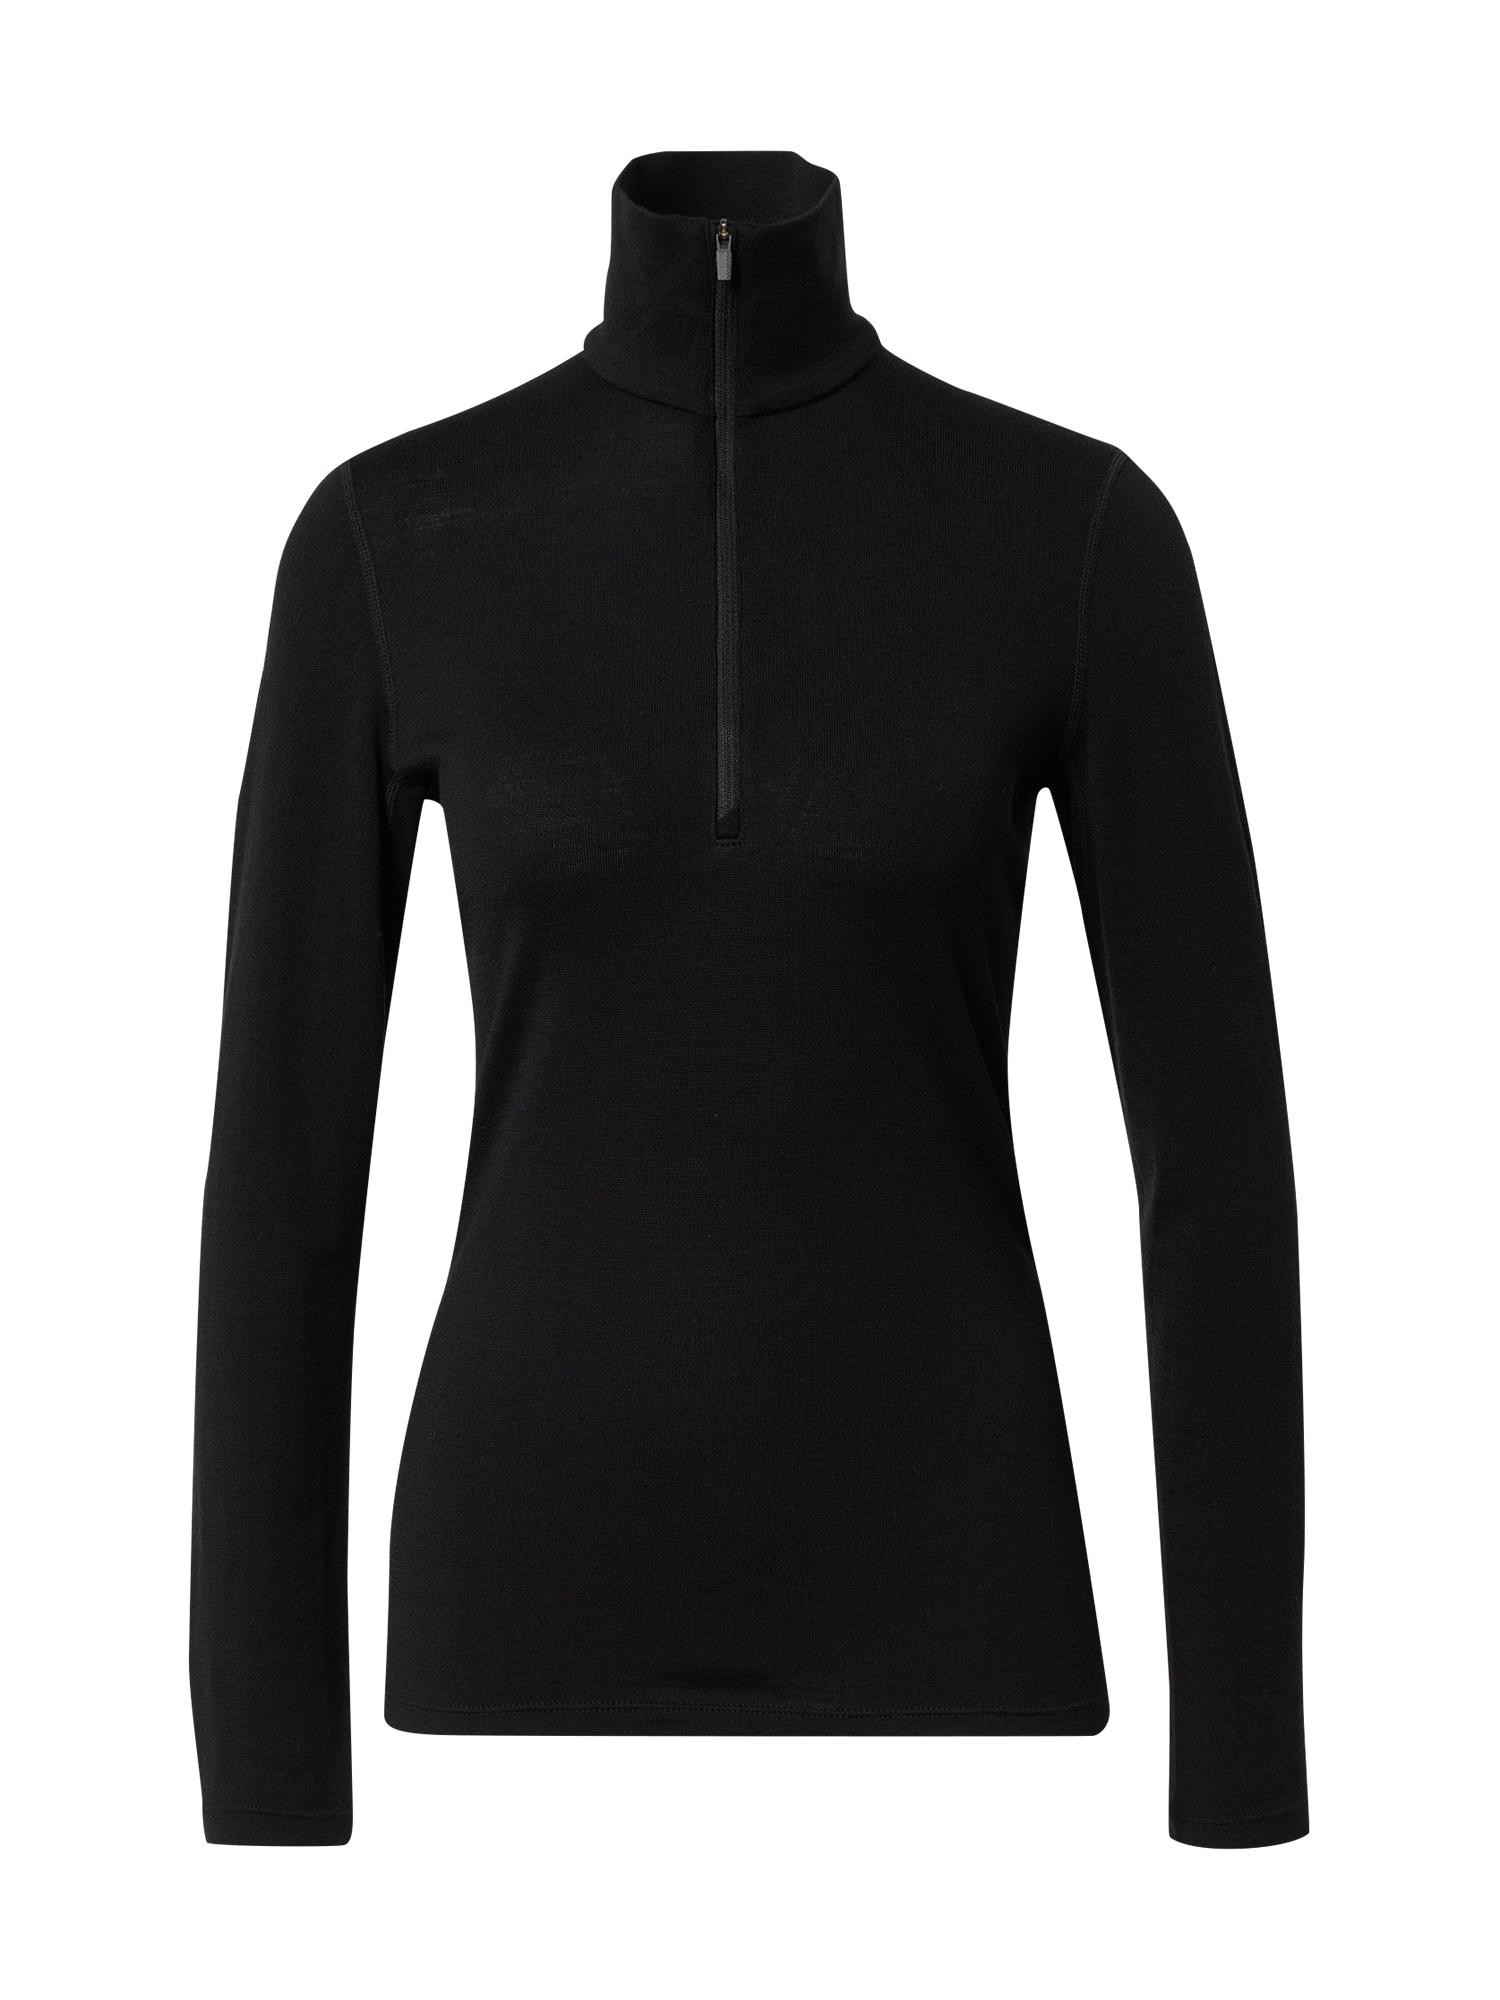 ICEBREAKER Sportinis megztinis juoda